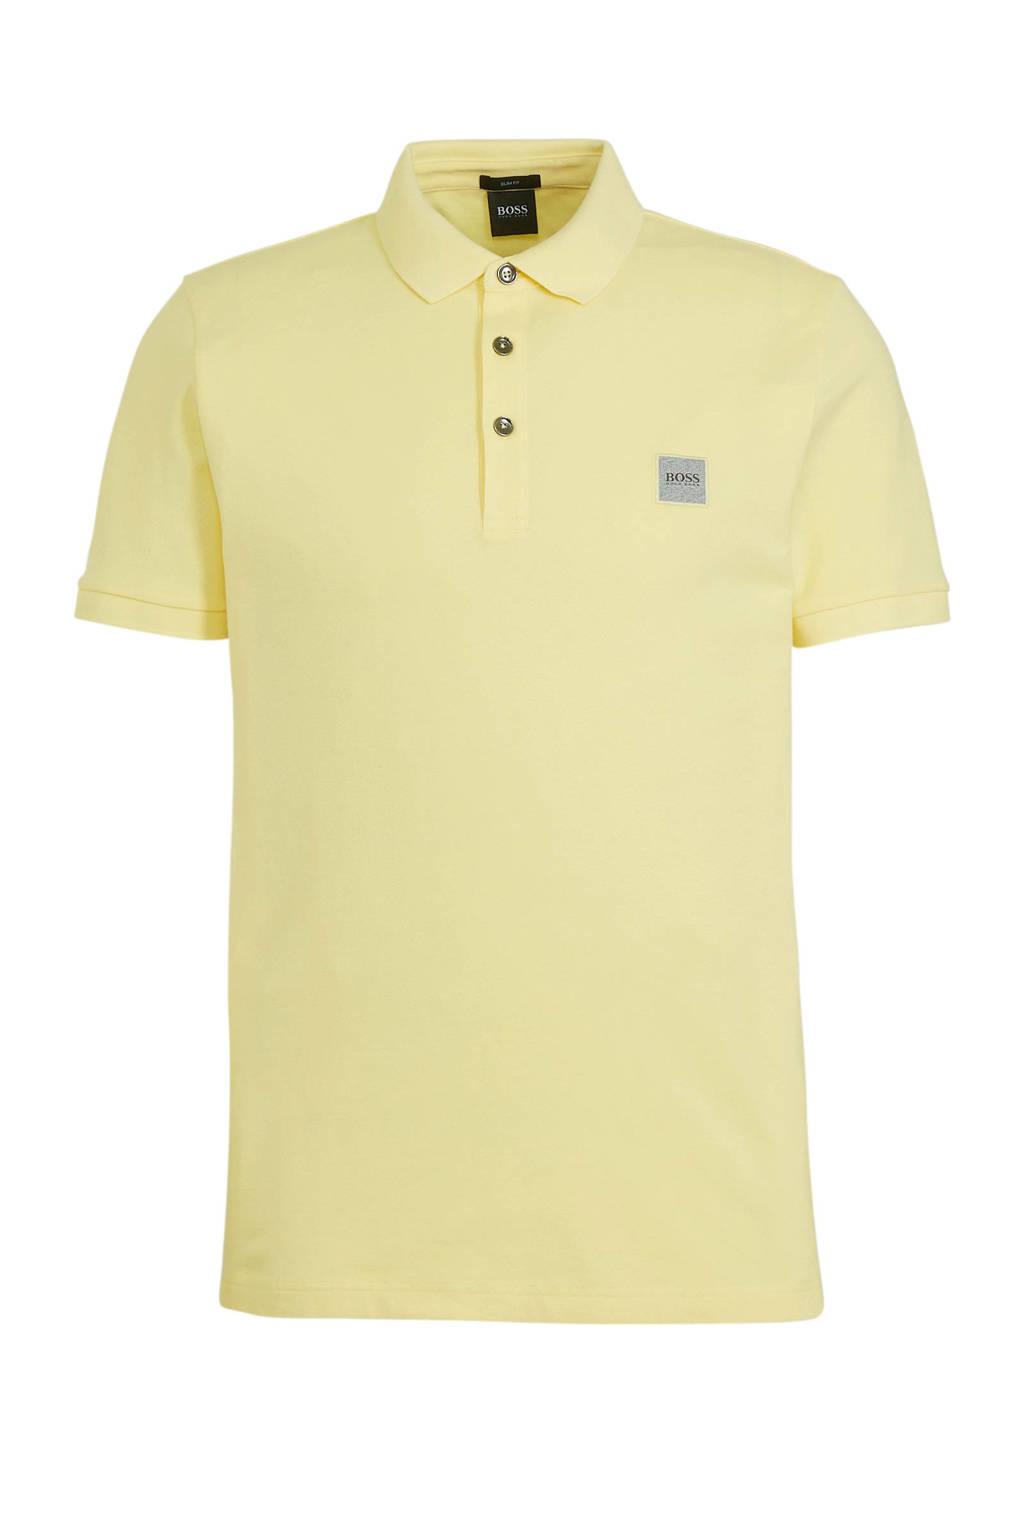 BOSS Casual slim fit polo Passenger pastel yellow, Pastel Yellow